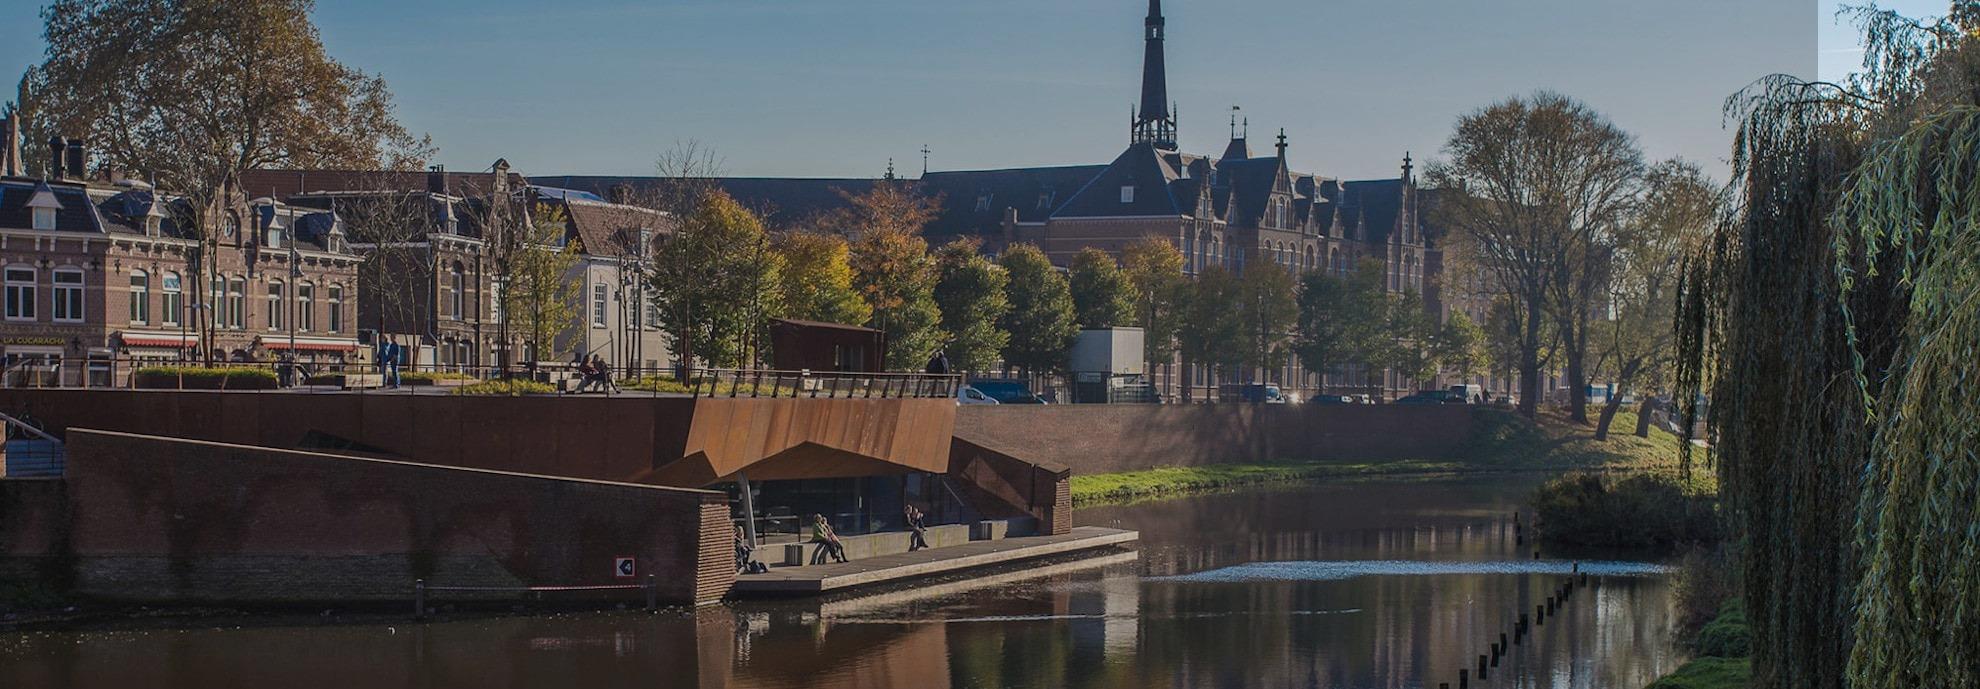 Vacatures in regio Den Bosch, Vacatures in Noord Brabant, Vacatures regio Tilburg, LEF Recruitment, Recruitment Den Bosch